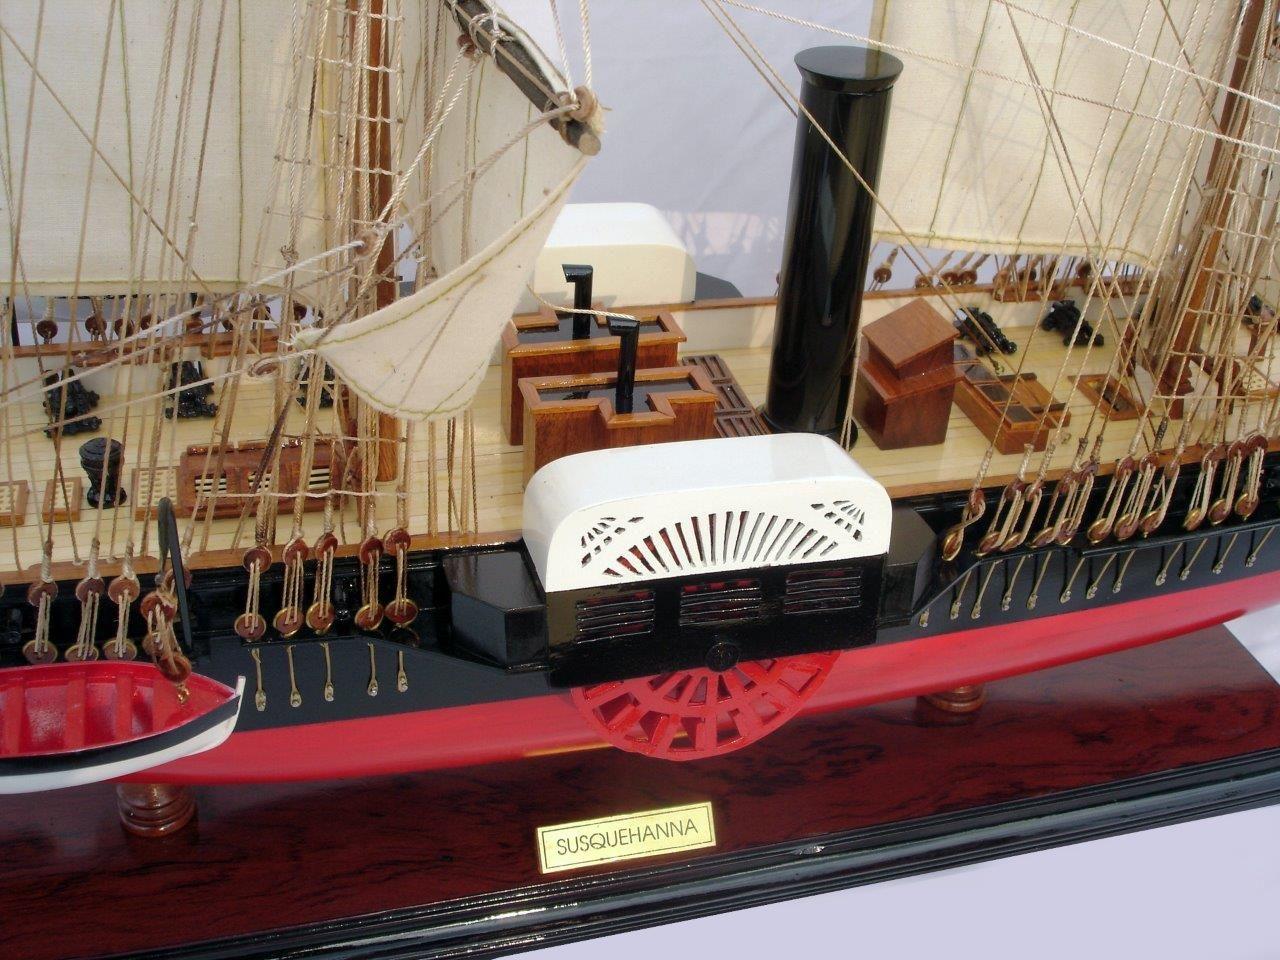 2098-12479-USS-Susquehanna-Model-Boat